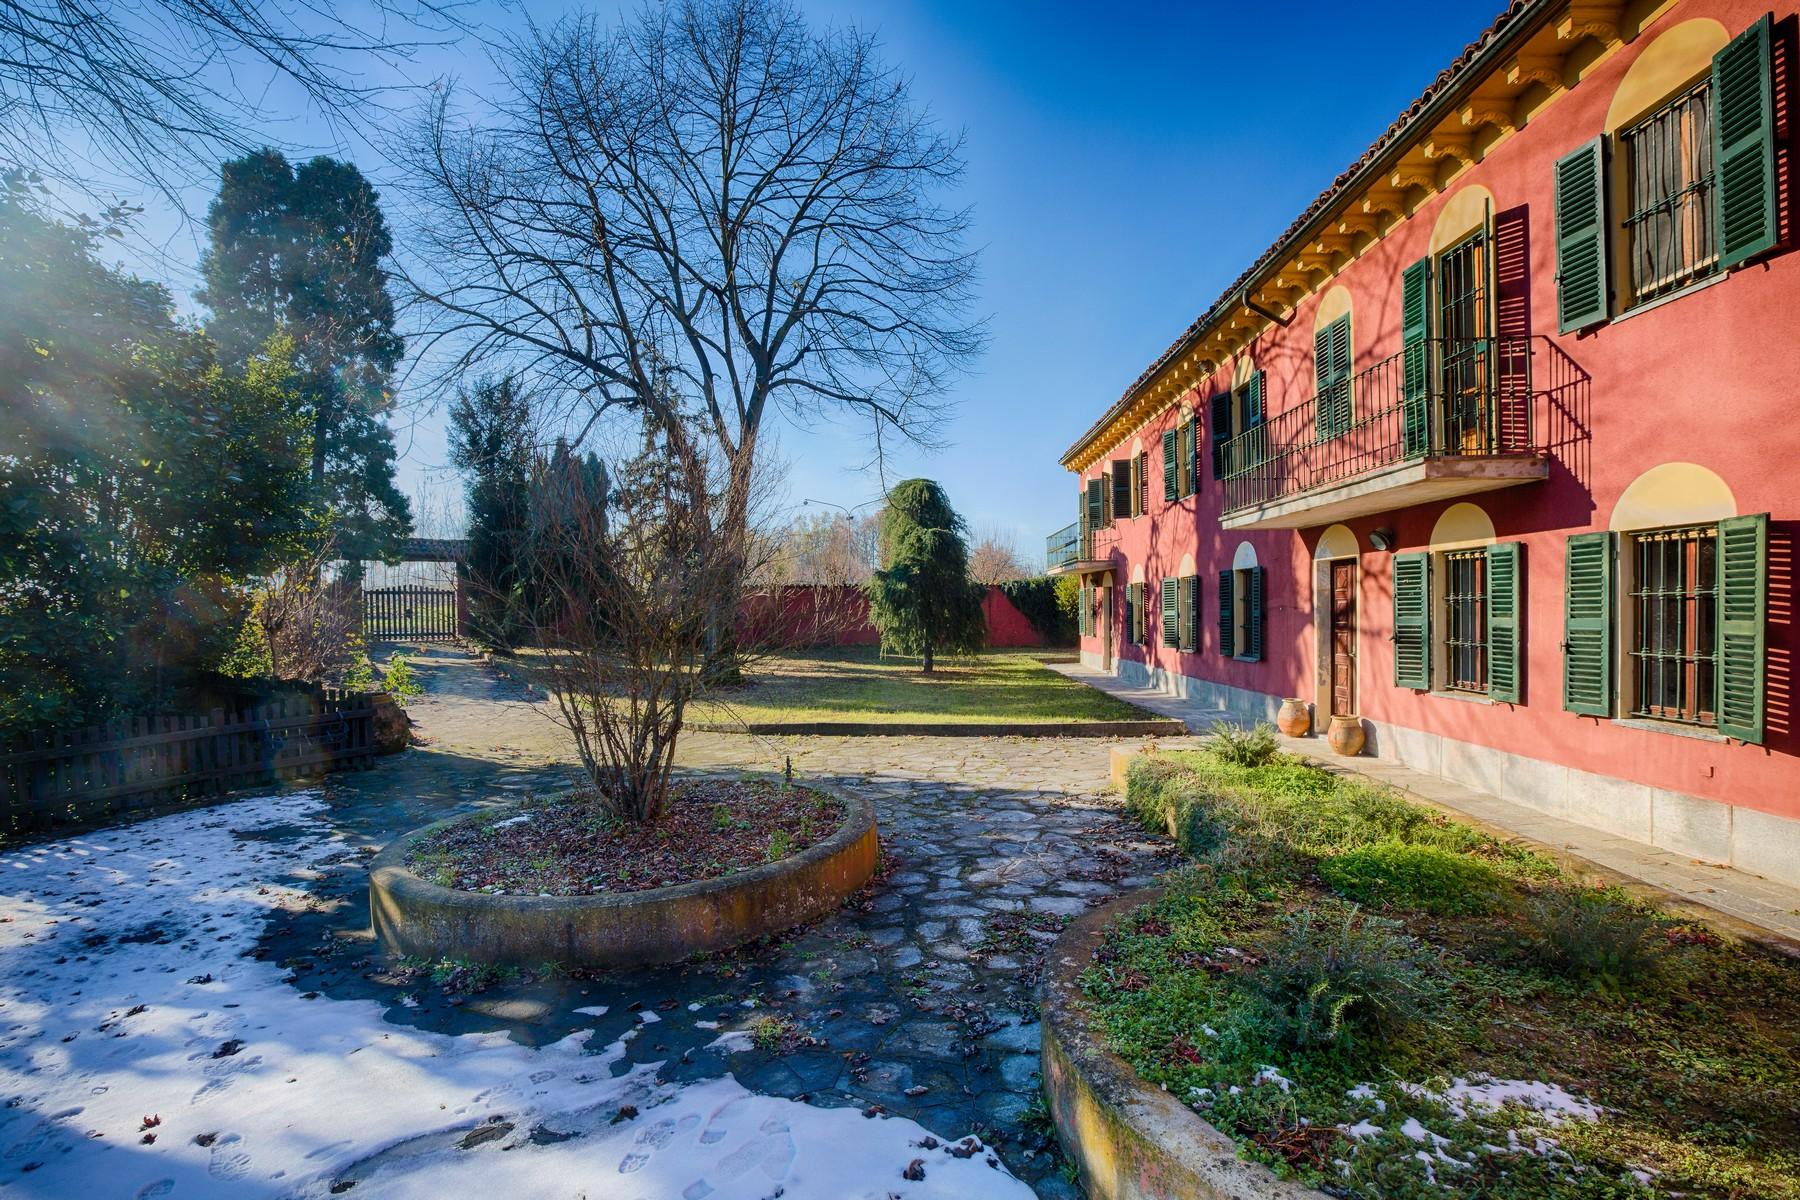 Single Family Homes for Sale at Incomparable farmhouse in the heart of Monferrato Fubine, Alessandria Italy